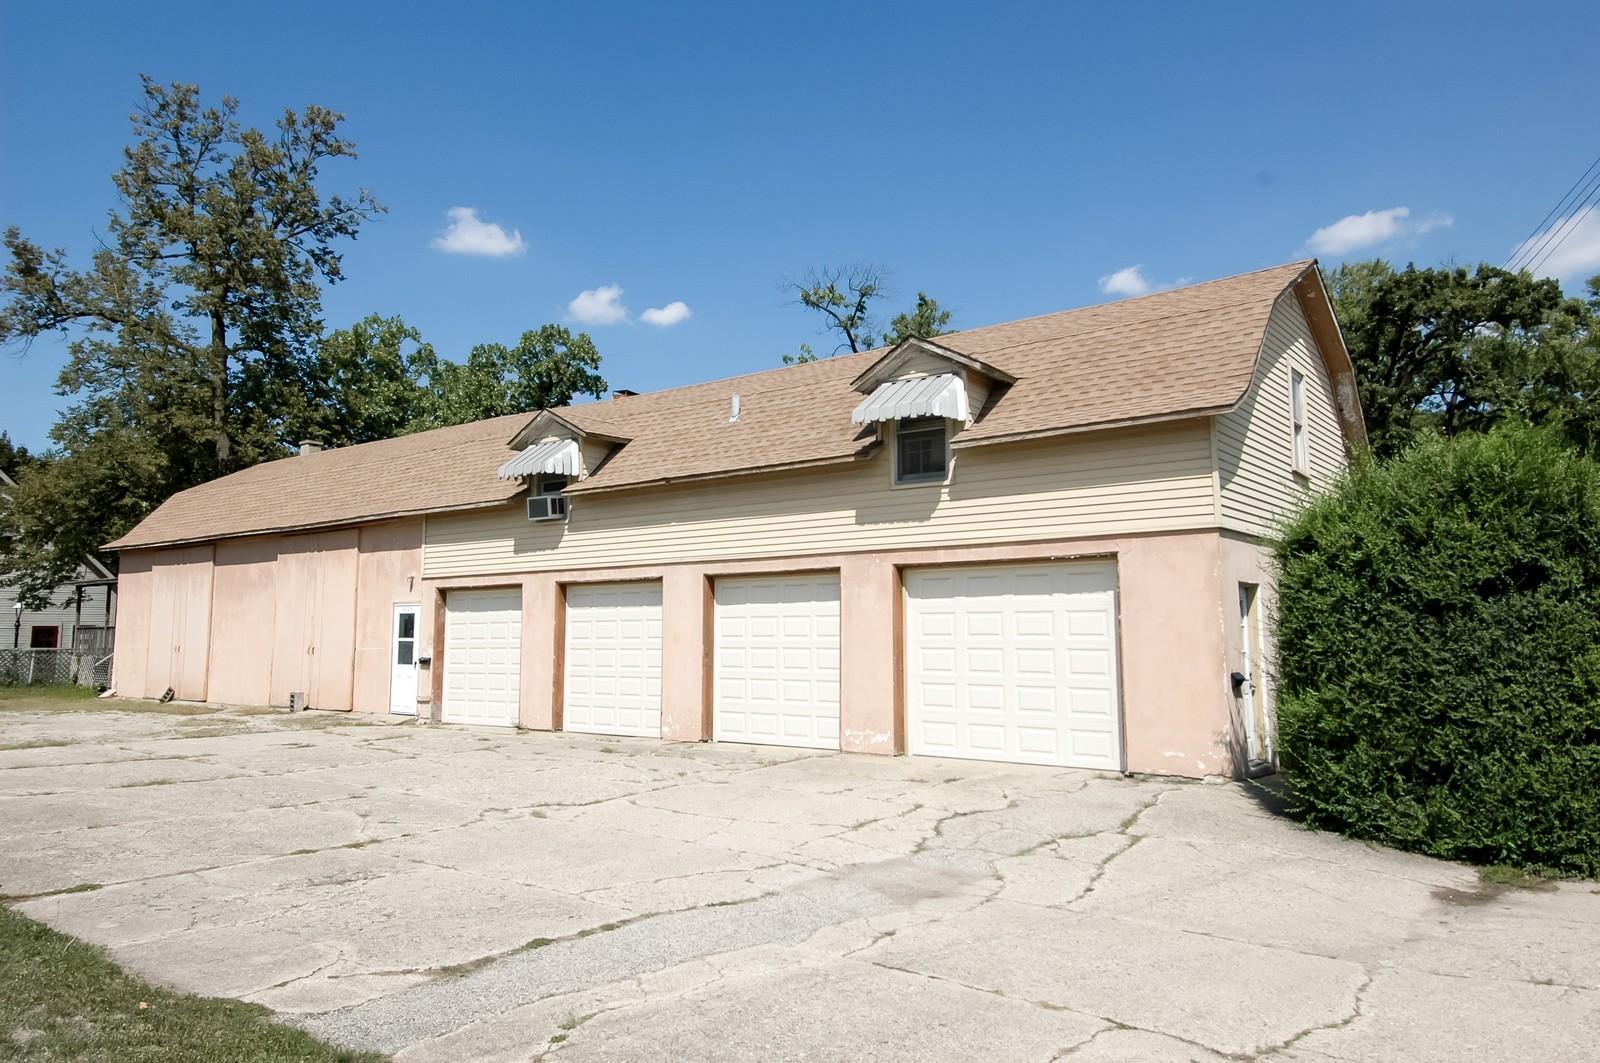 Real Estate Photography - 302 Washington, Algonquin, IL, 60102 - Garage